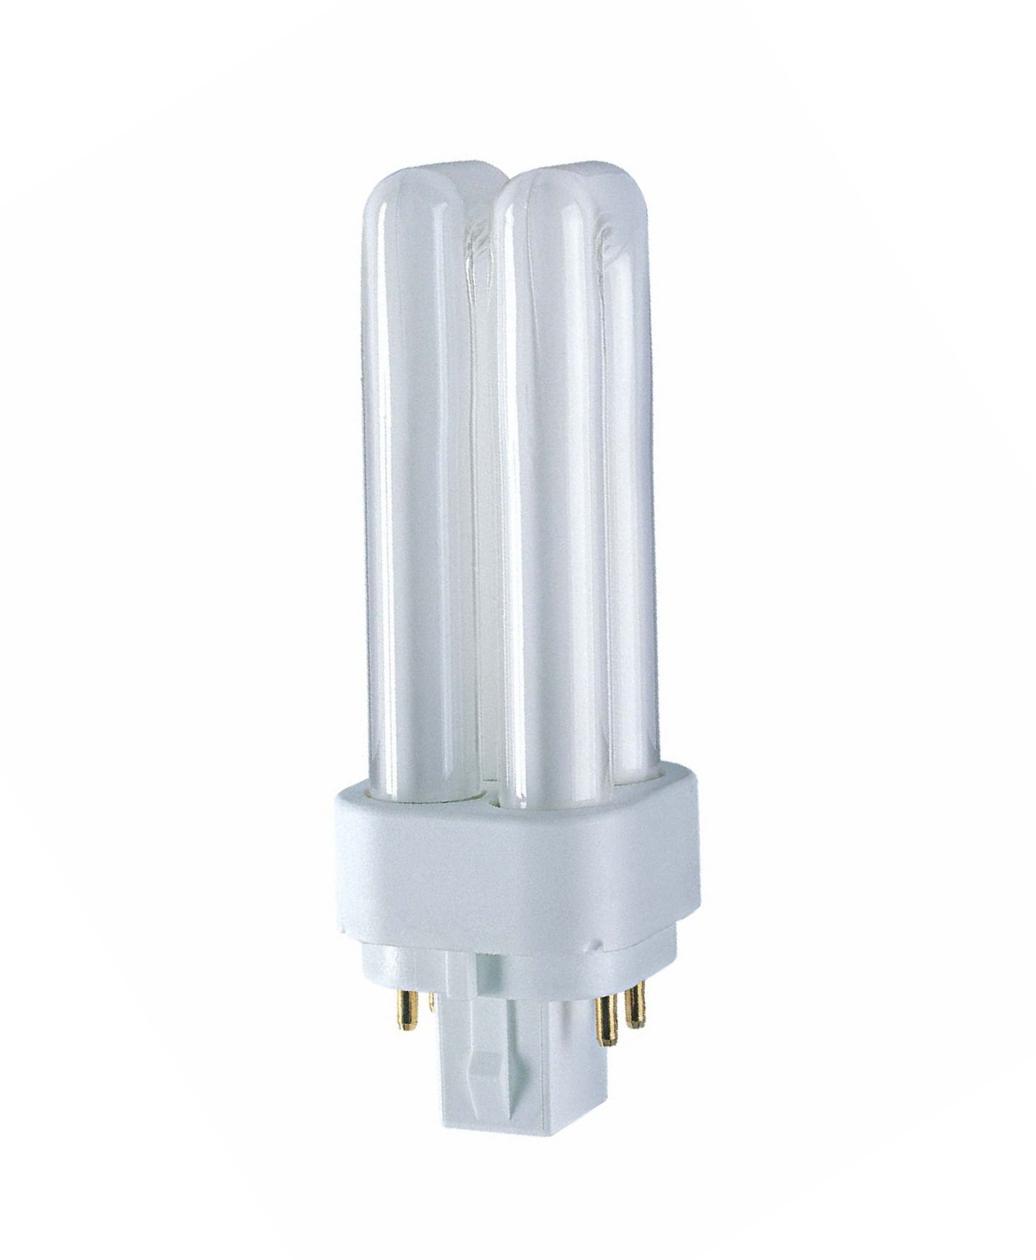 1 Stk TC-DEL 13W/827 G24Q-1 Kompaktleuchtstofflampe LI5V012131